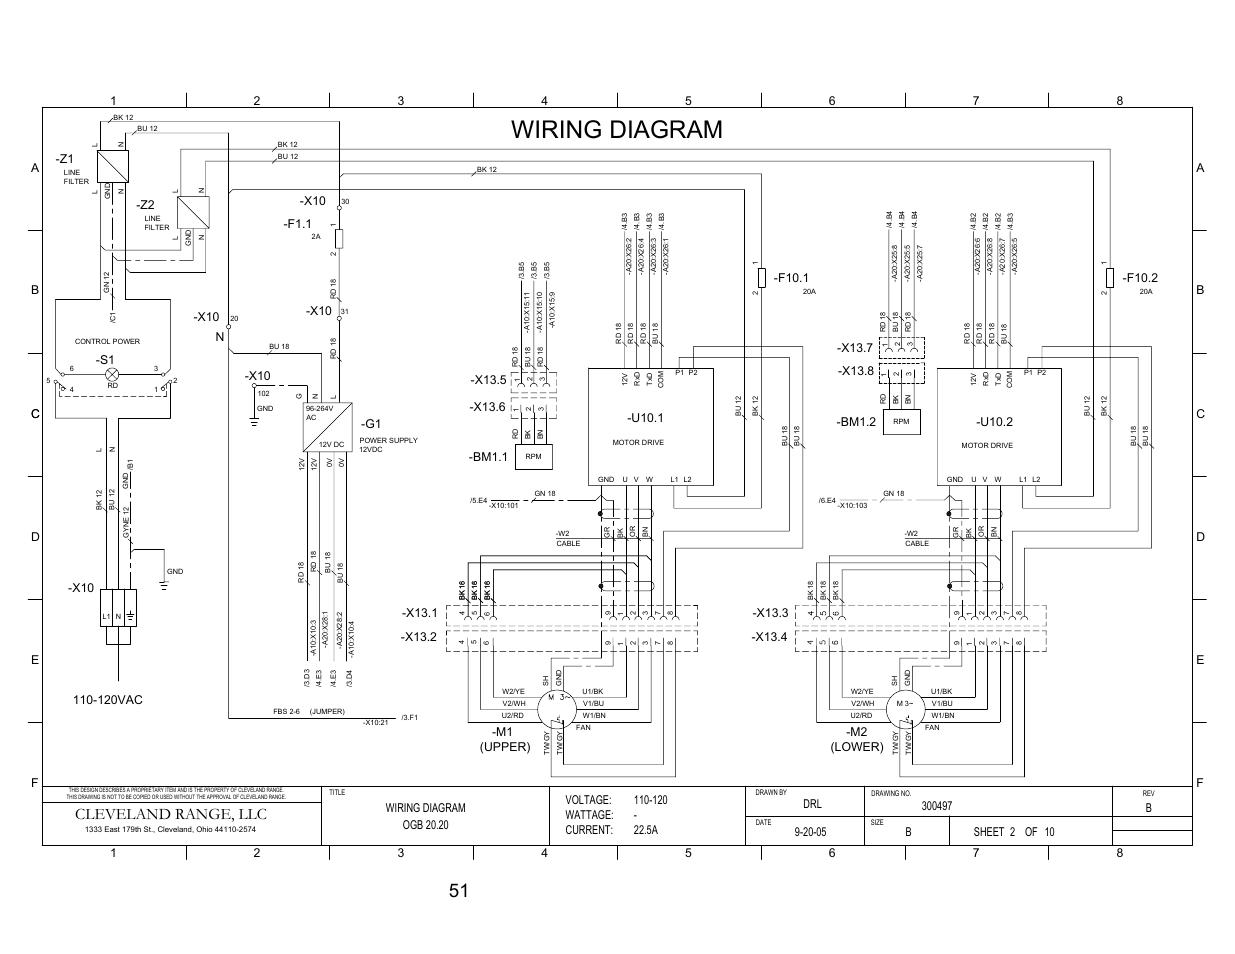 Pg 2, Wiring diagram, Cleveland range, llc | Cleveland Range ... X Wiring Diagram on